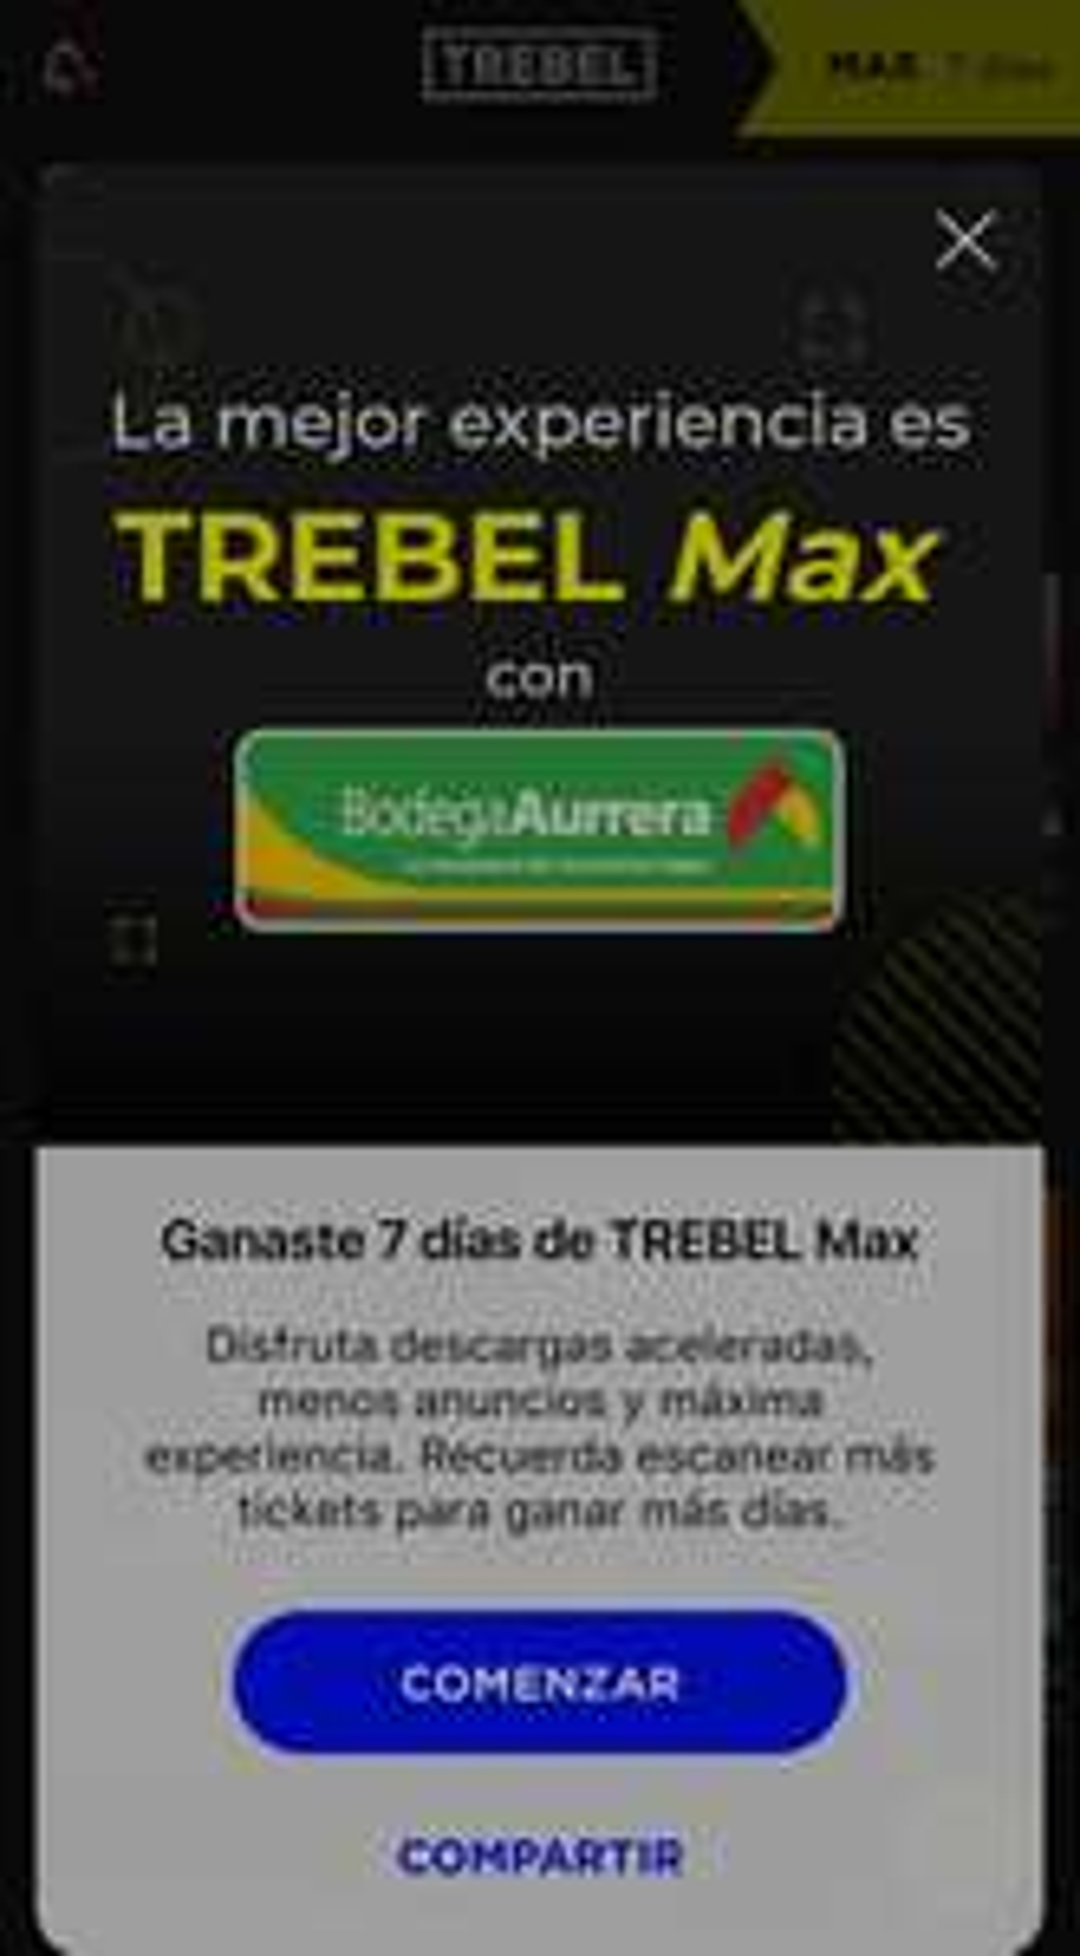 Trebel Max(música grátis sin anuncios): 7 dias Gratis al escanear codigo de Walmart o Bodega Aurrera